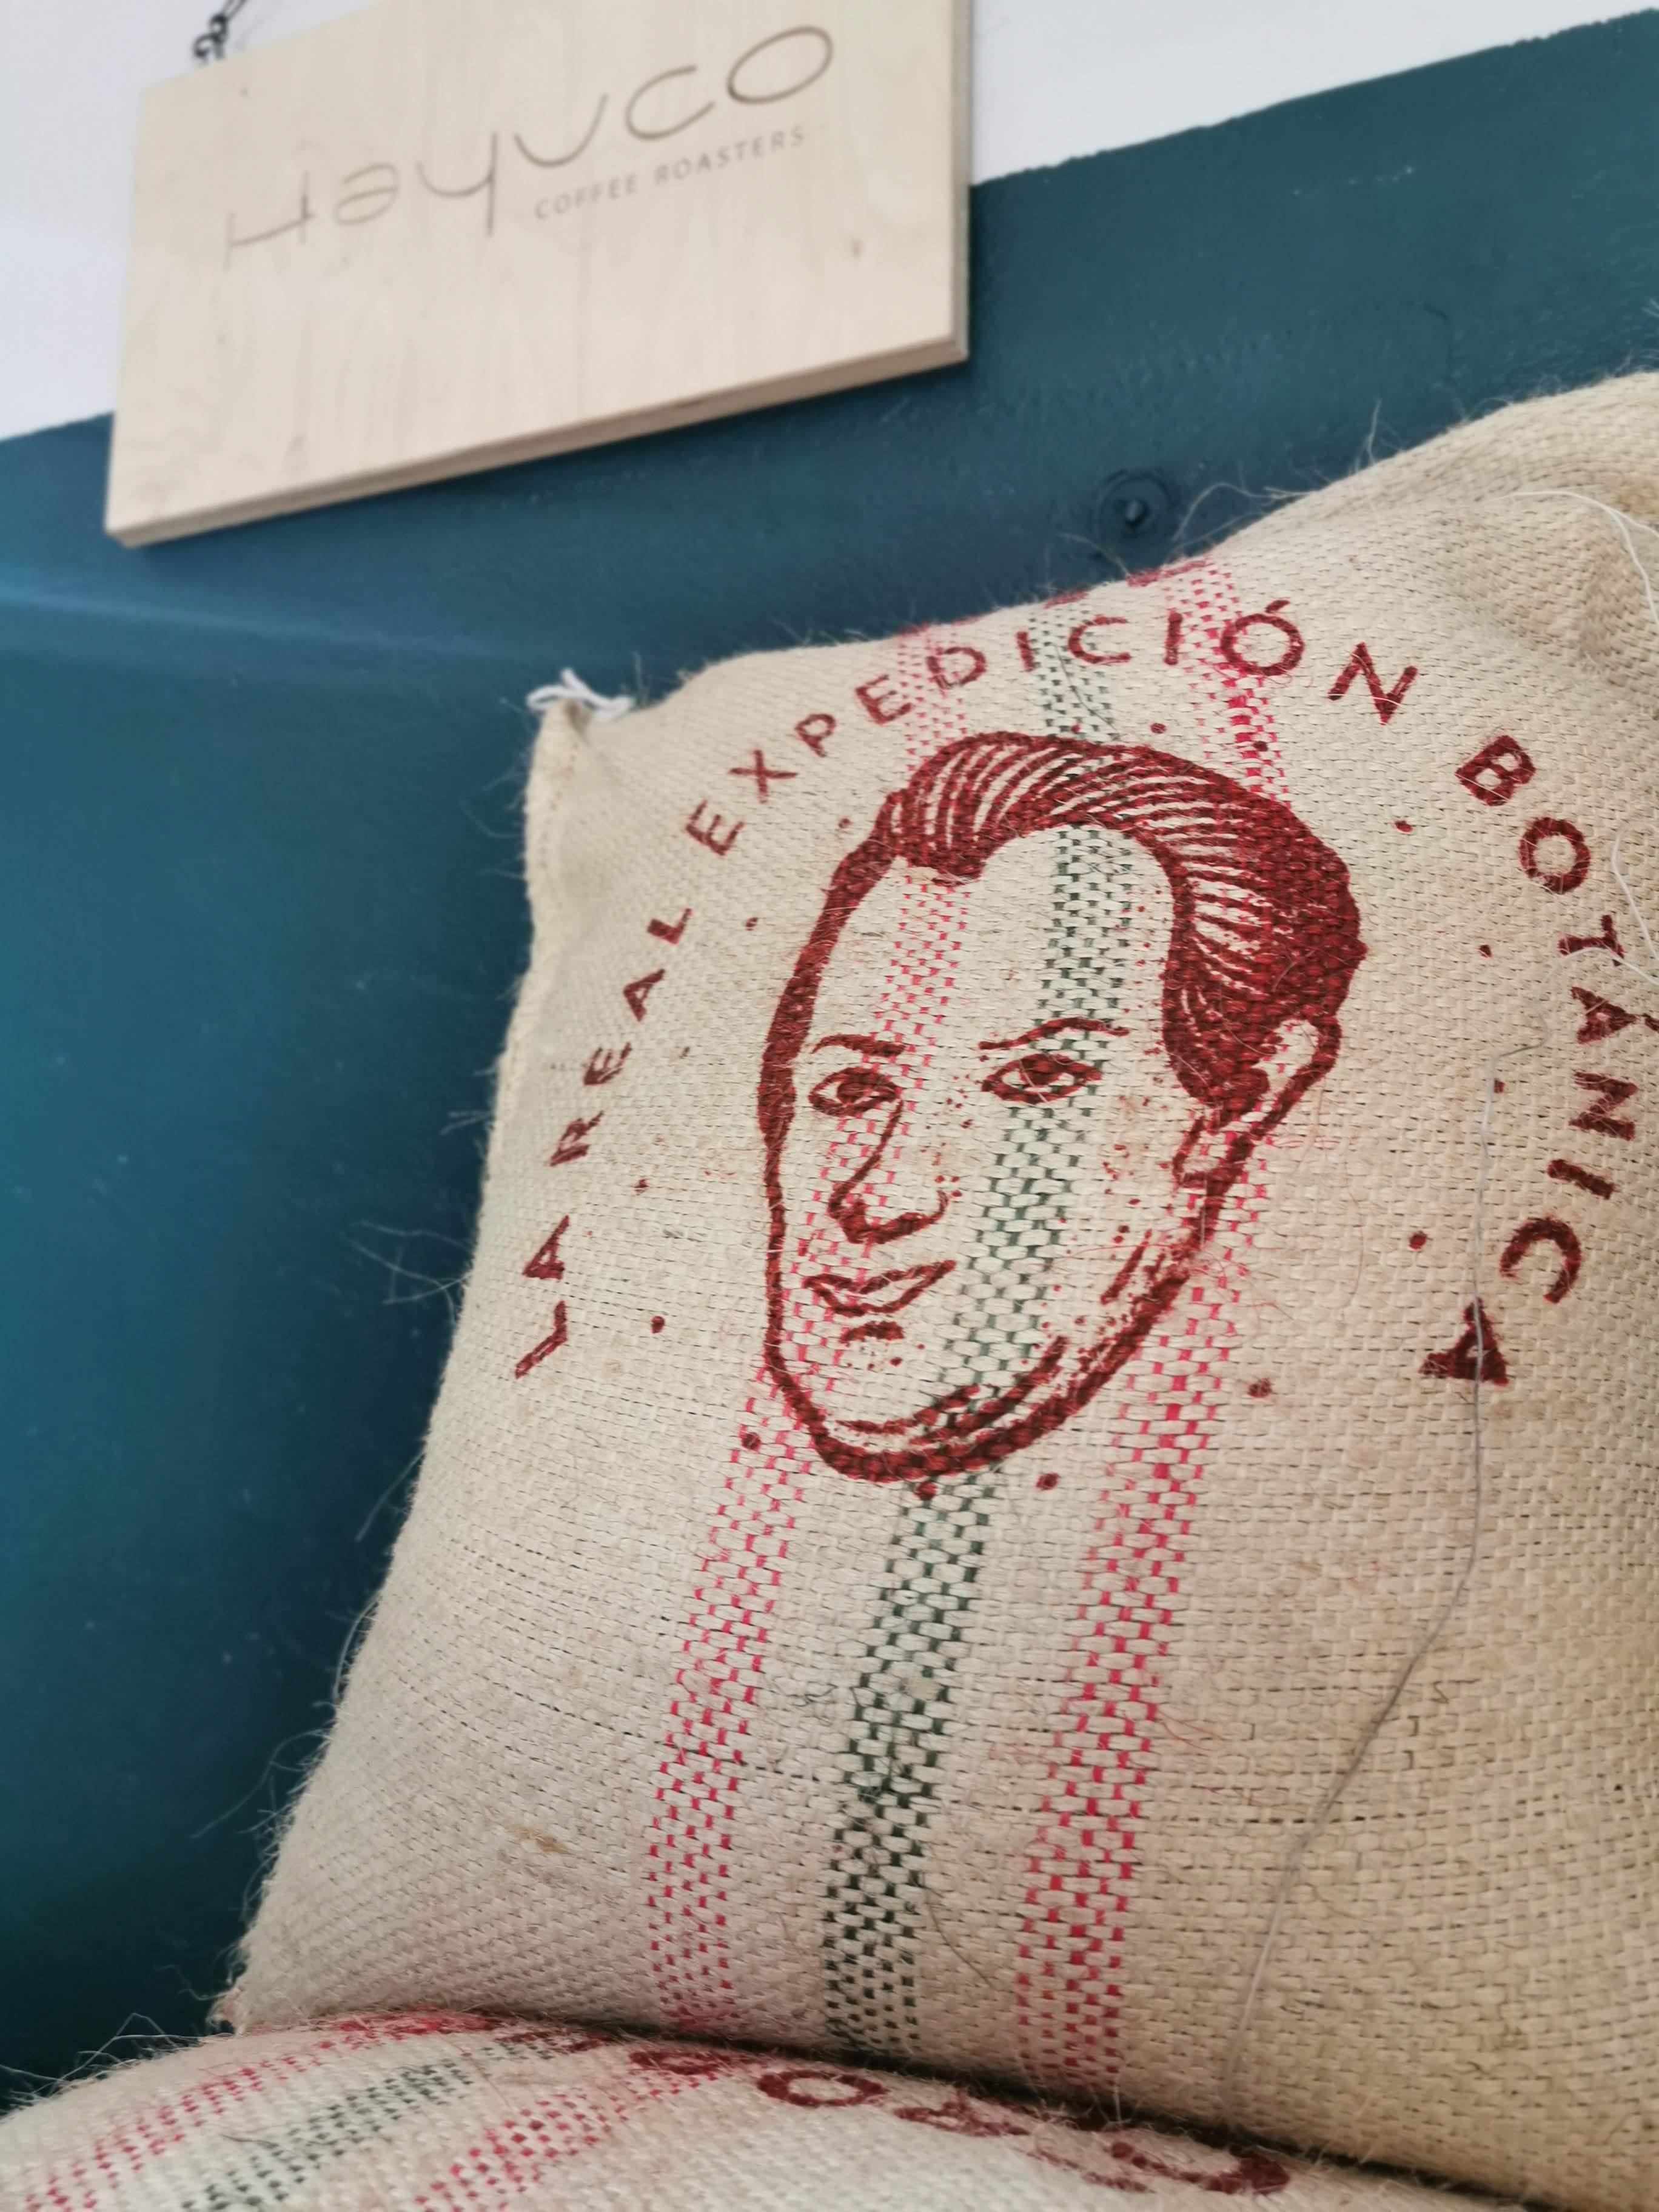 Hayuco Coffee Roasters